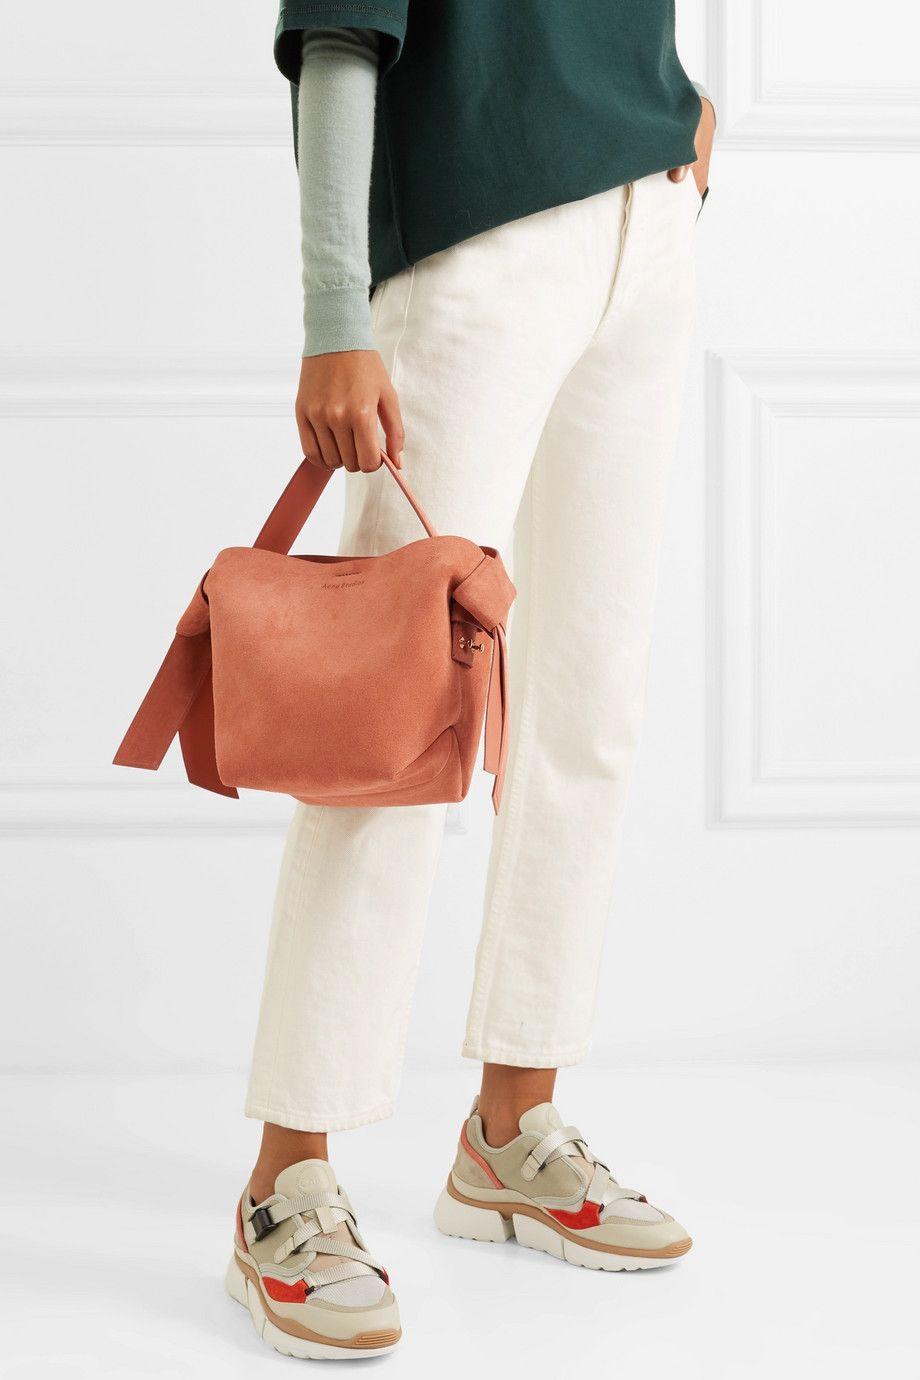 Musubi Mini knotted suede shoulder bag | Acne studios bag